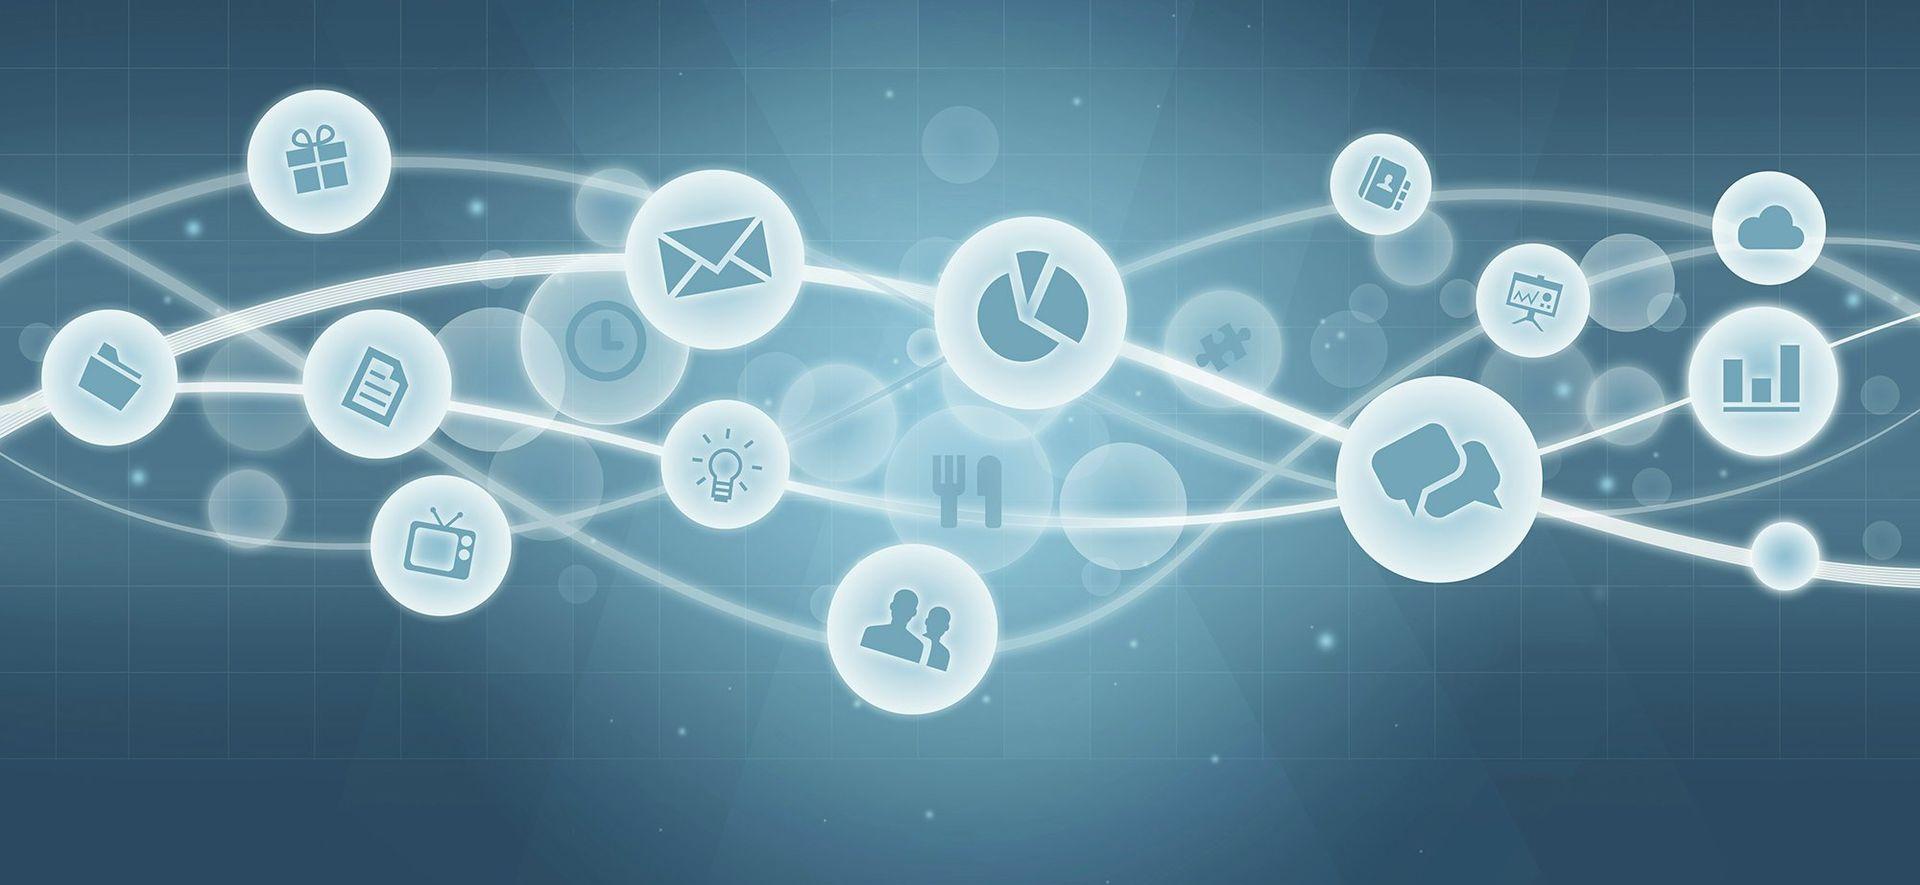 Social Media Marketing: Talk With Customers, Not At Them